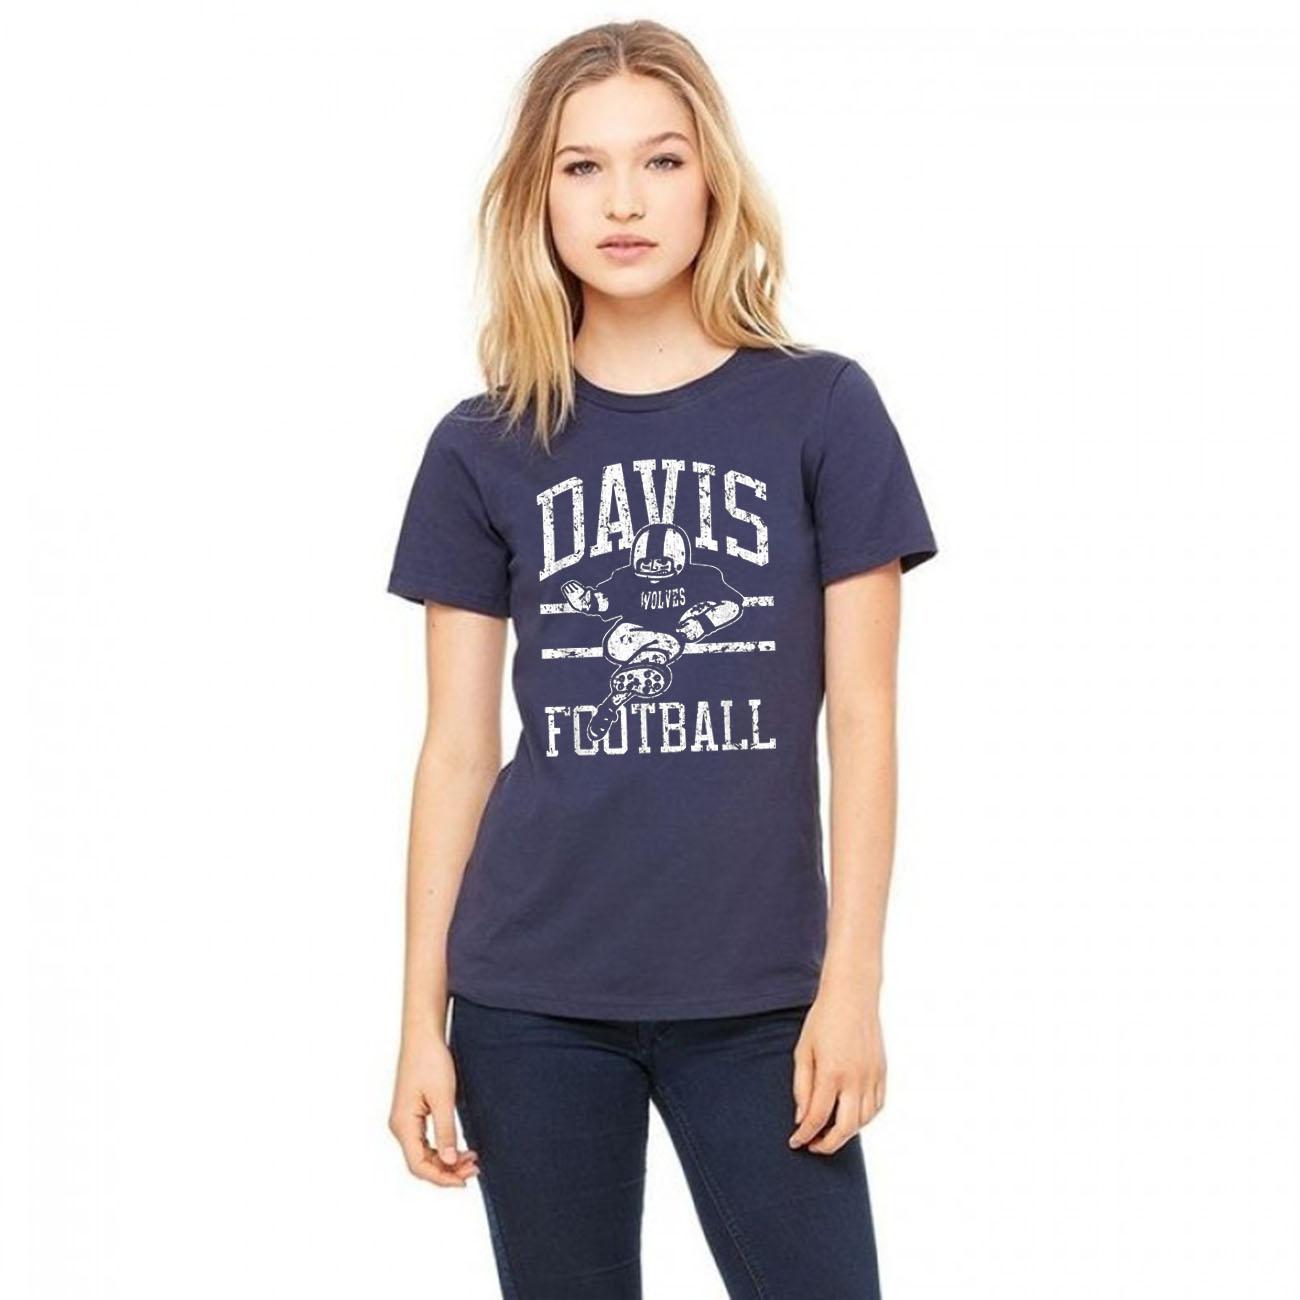 Davis Wolves FB Player Gift T-Shirts